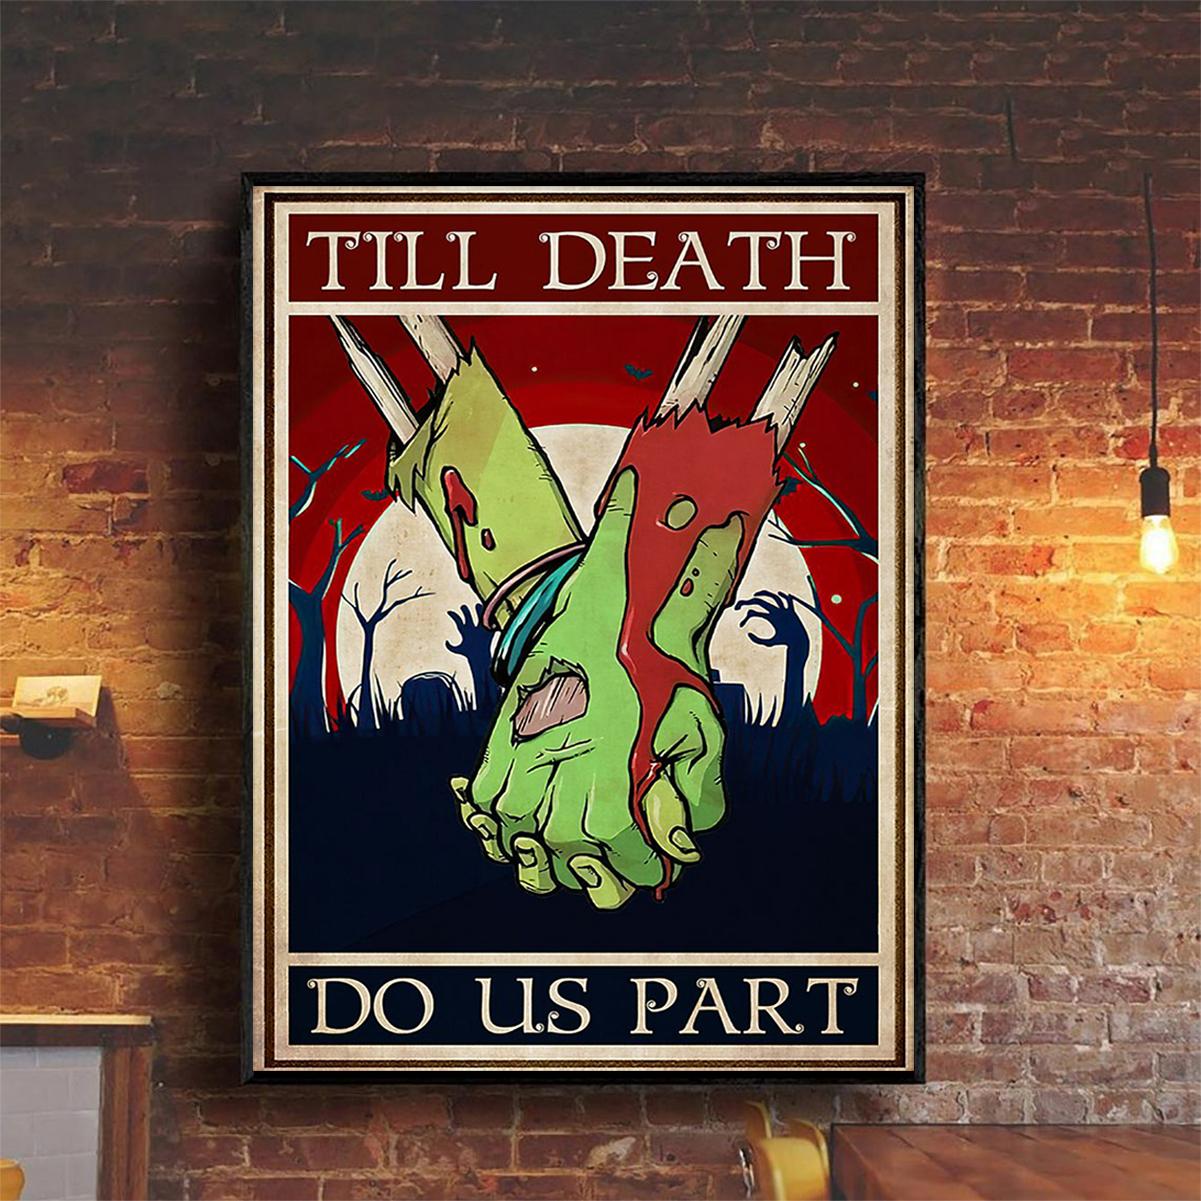 Zombie couple till death do us part poster A2